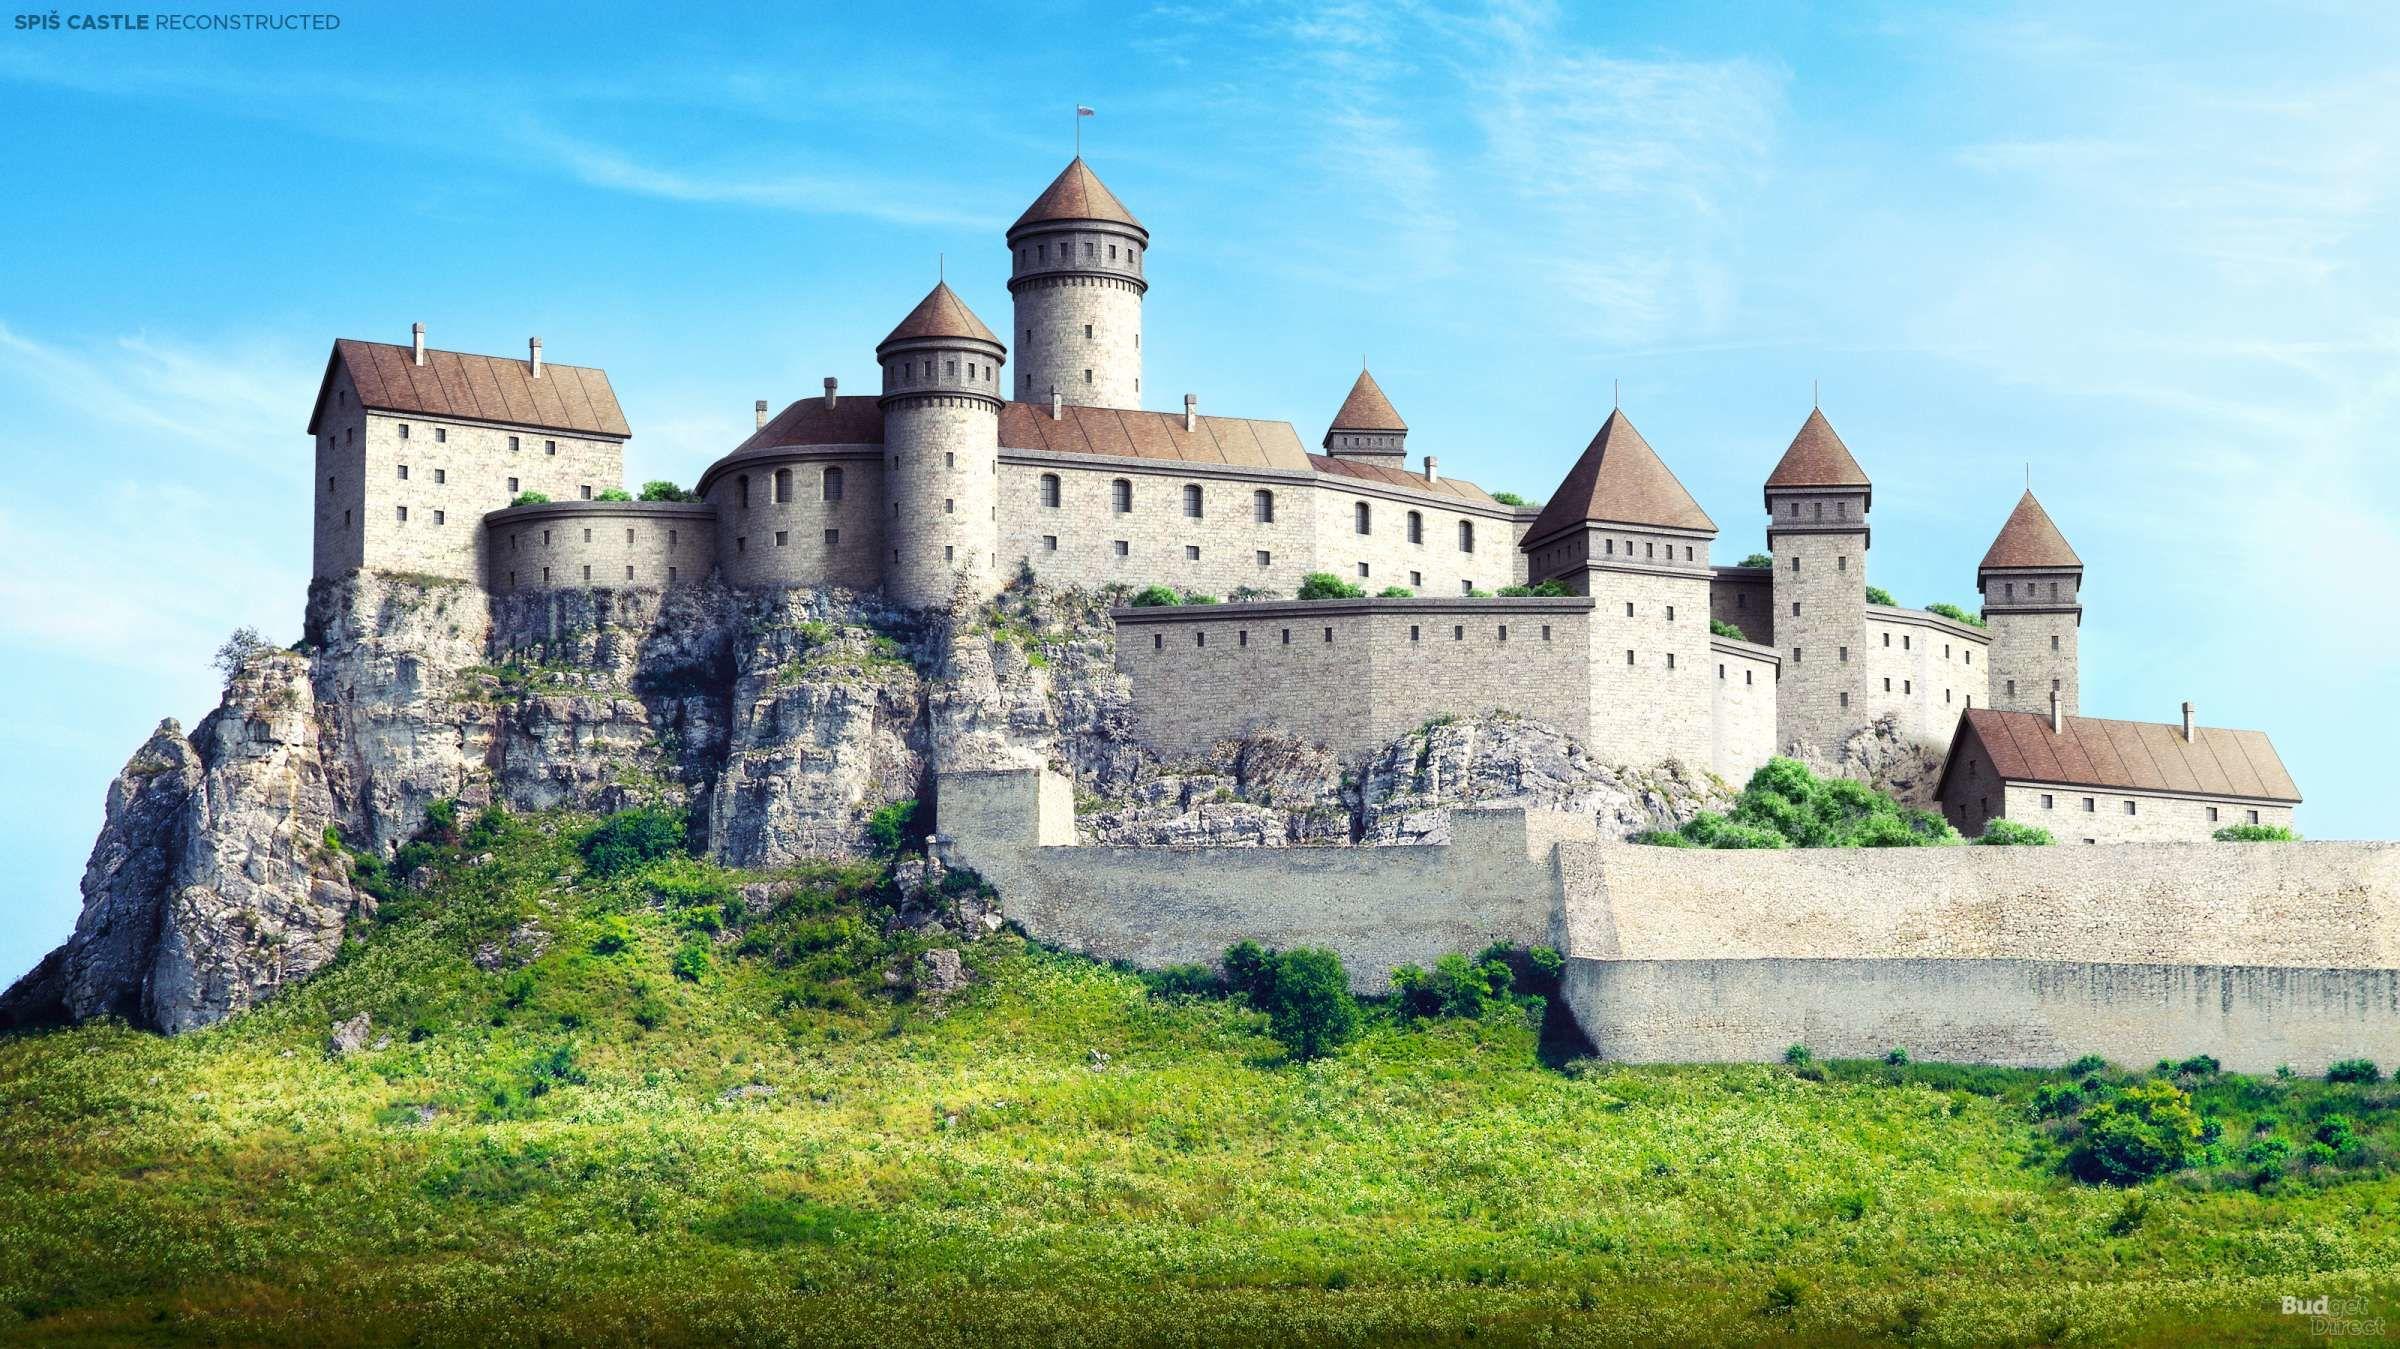 7 Historic European Castles Virtually Rebuilt Before Your Very Eyes